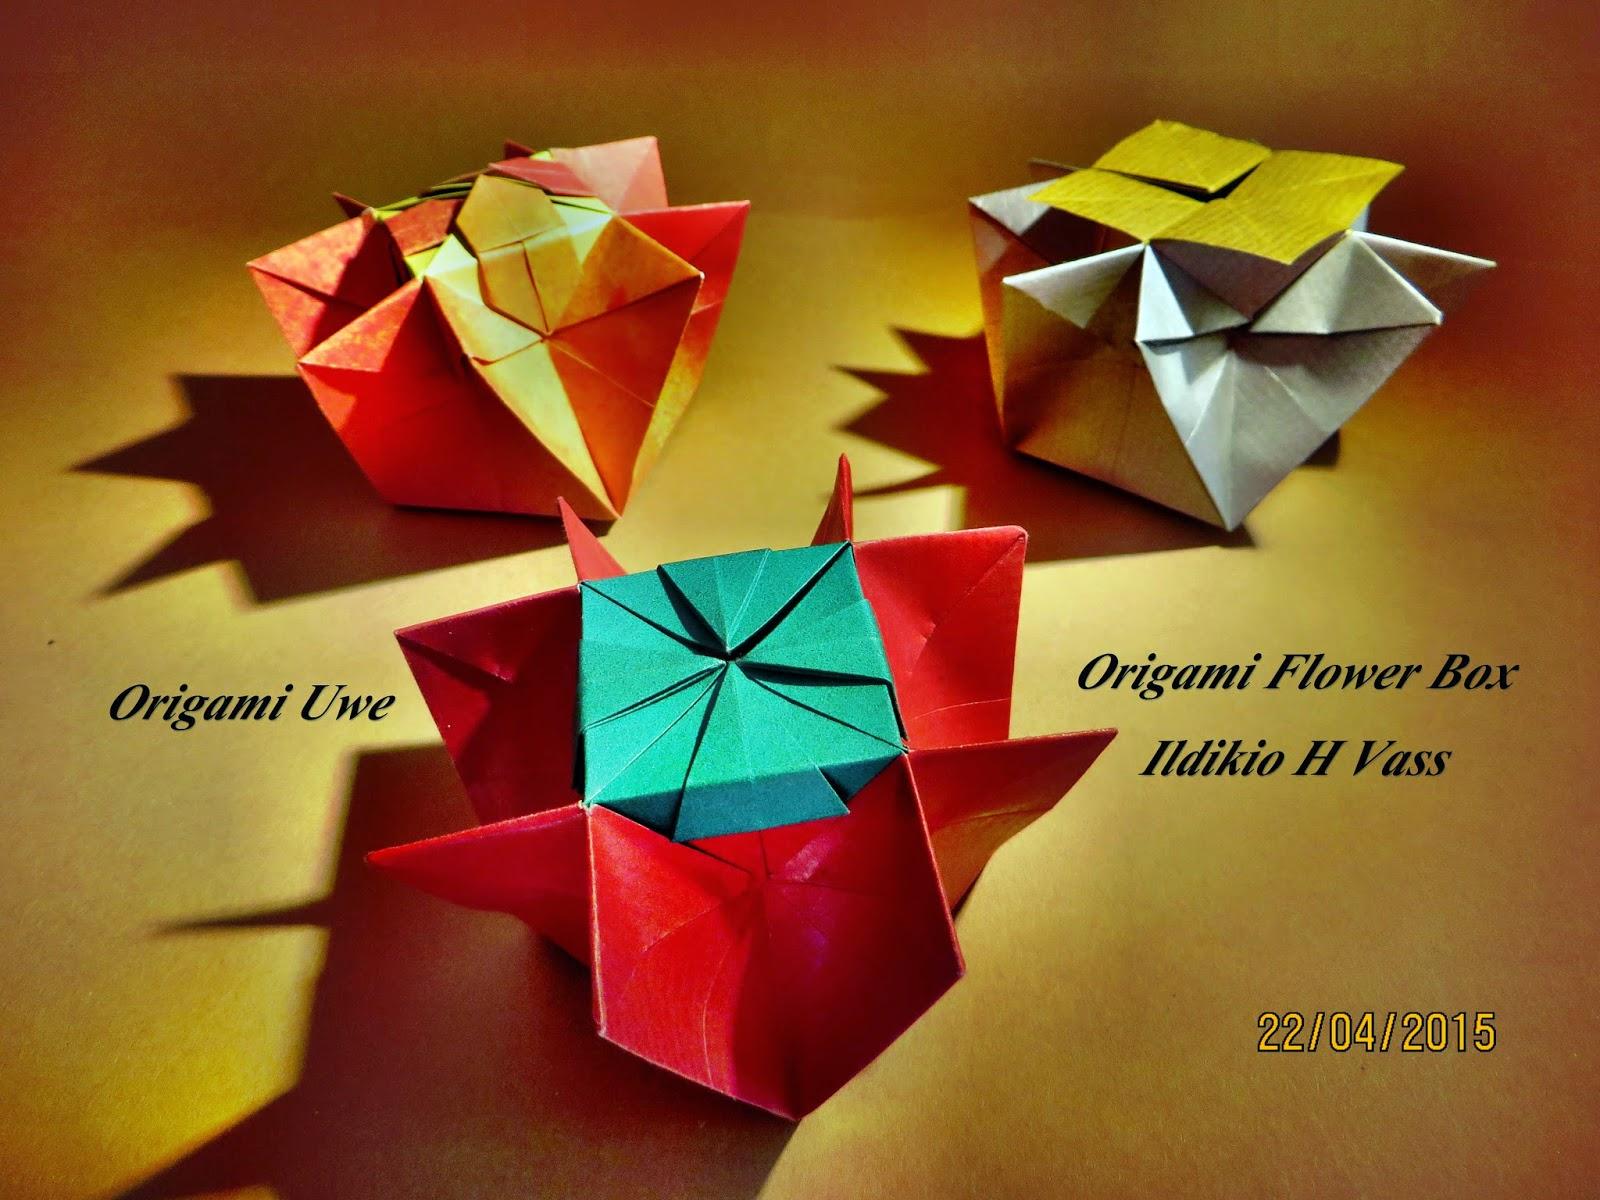 Origami, Fleurogami und Sterne: Origami Flower Box - photo#38